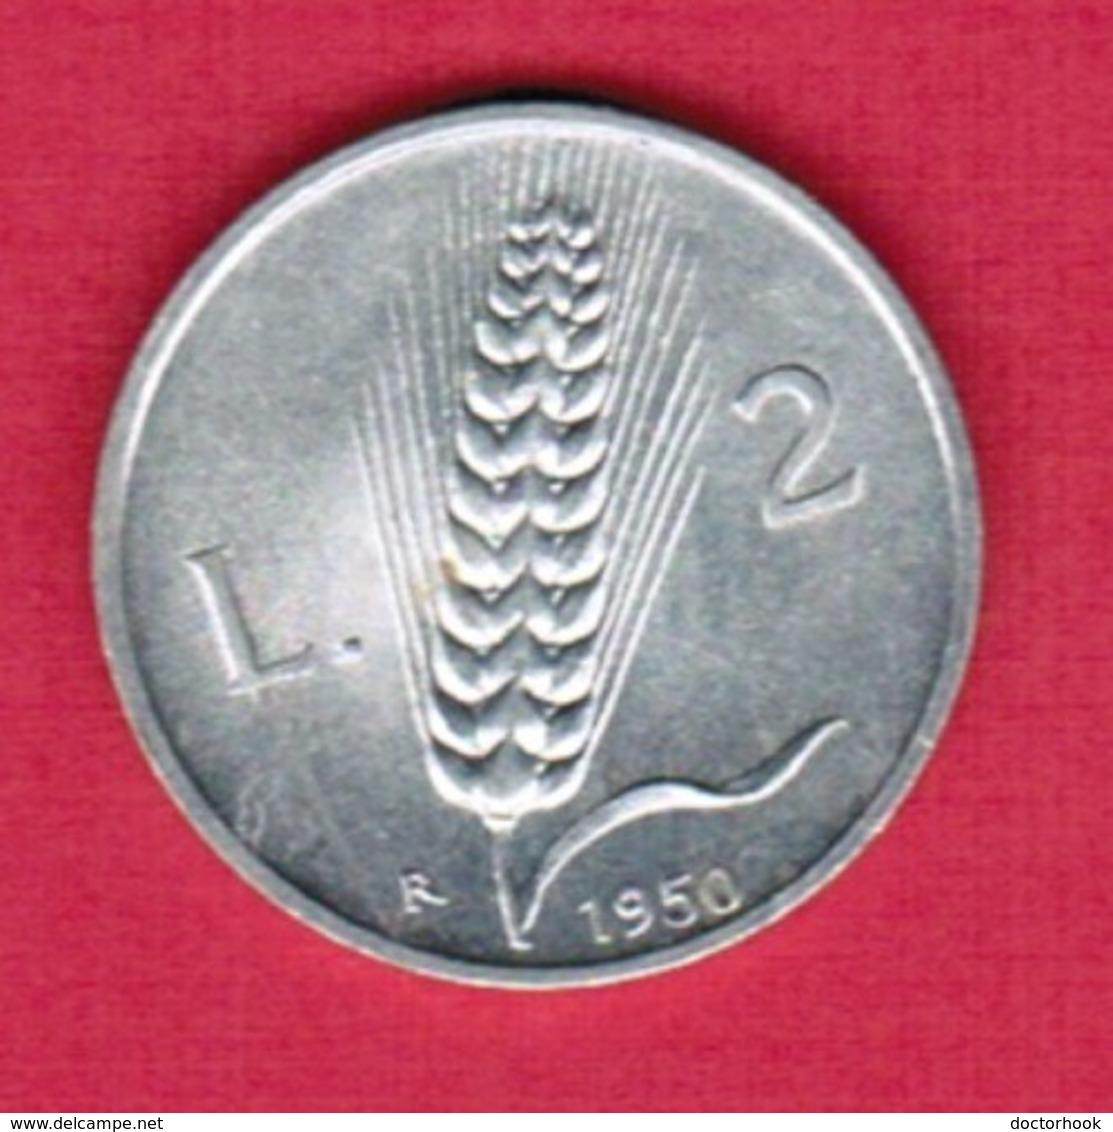 ITALY   2 LIRE 1950 (KM # 88) #5360 - 2 Lire